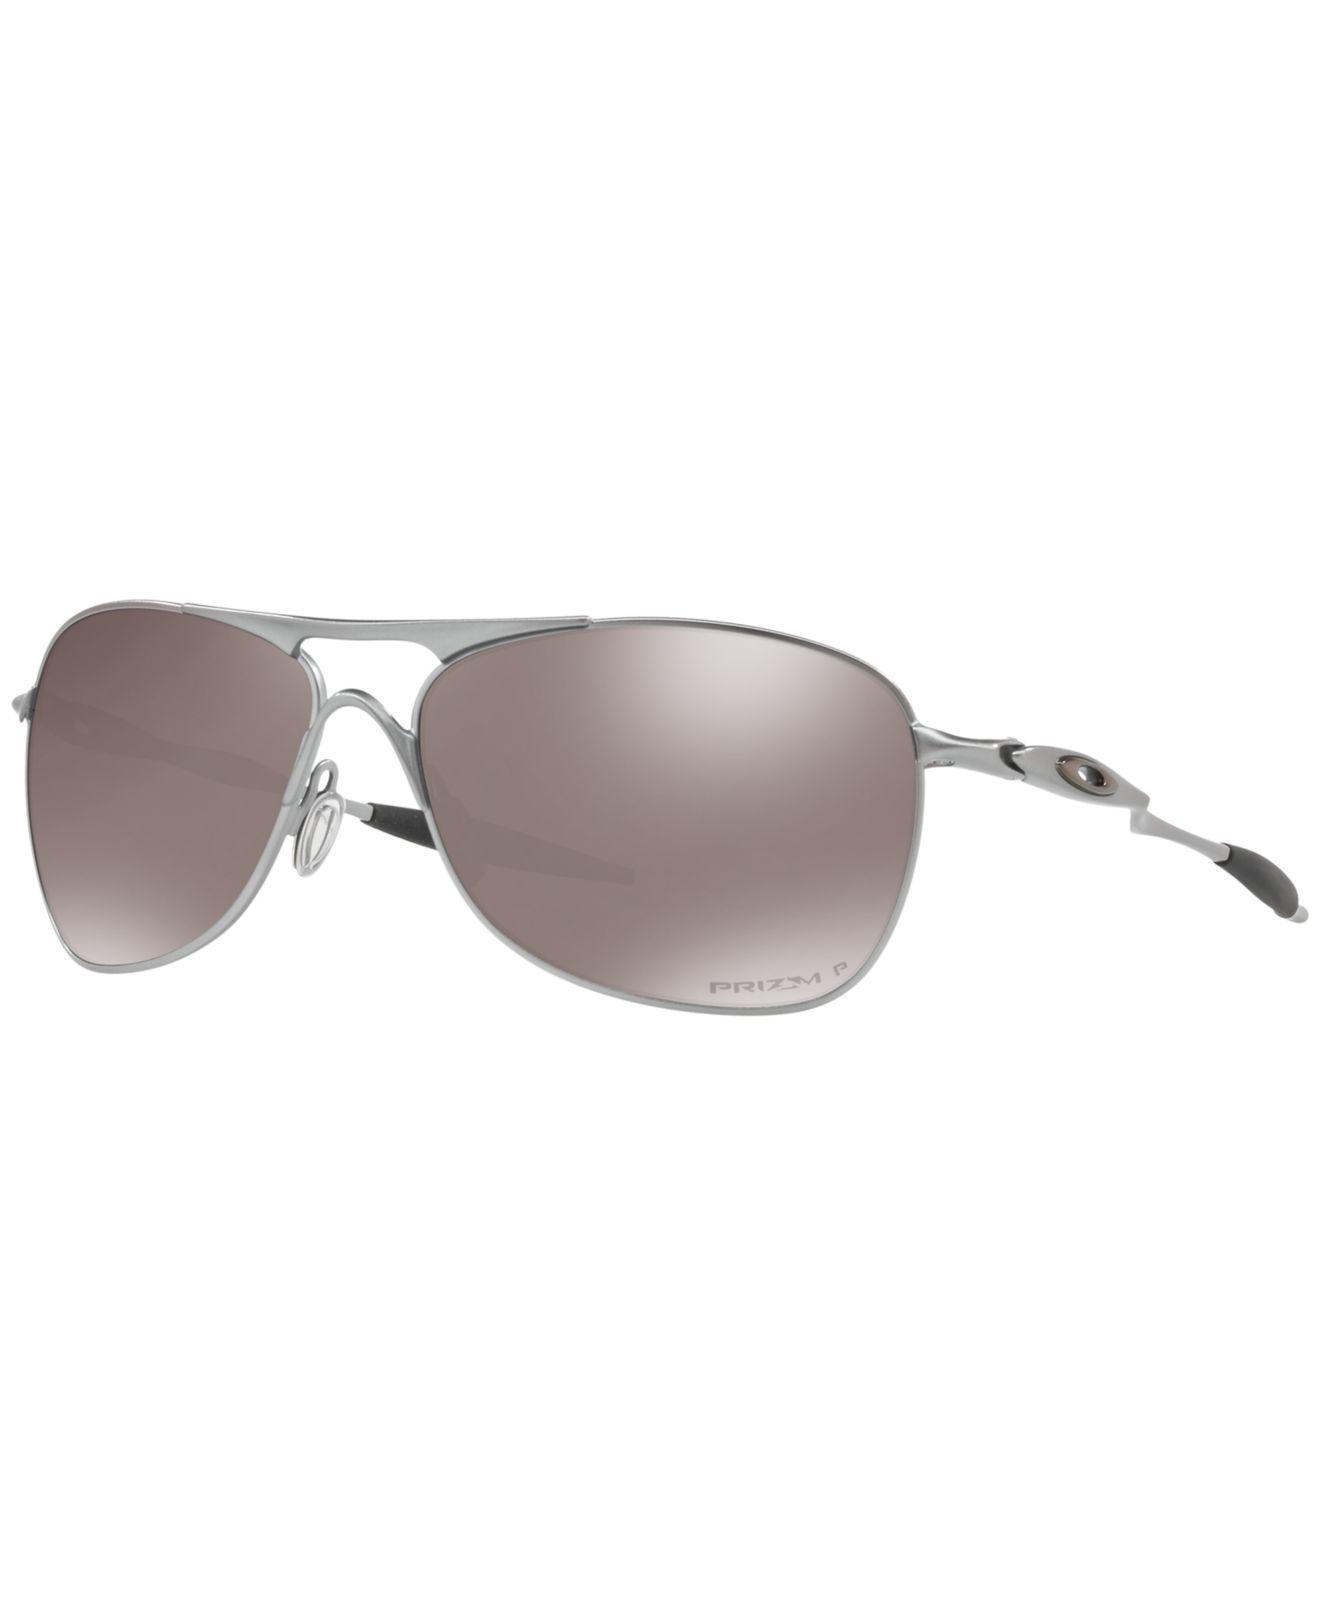 93b2e33b1b Oakley. Men s Gray Sunglasses